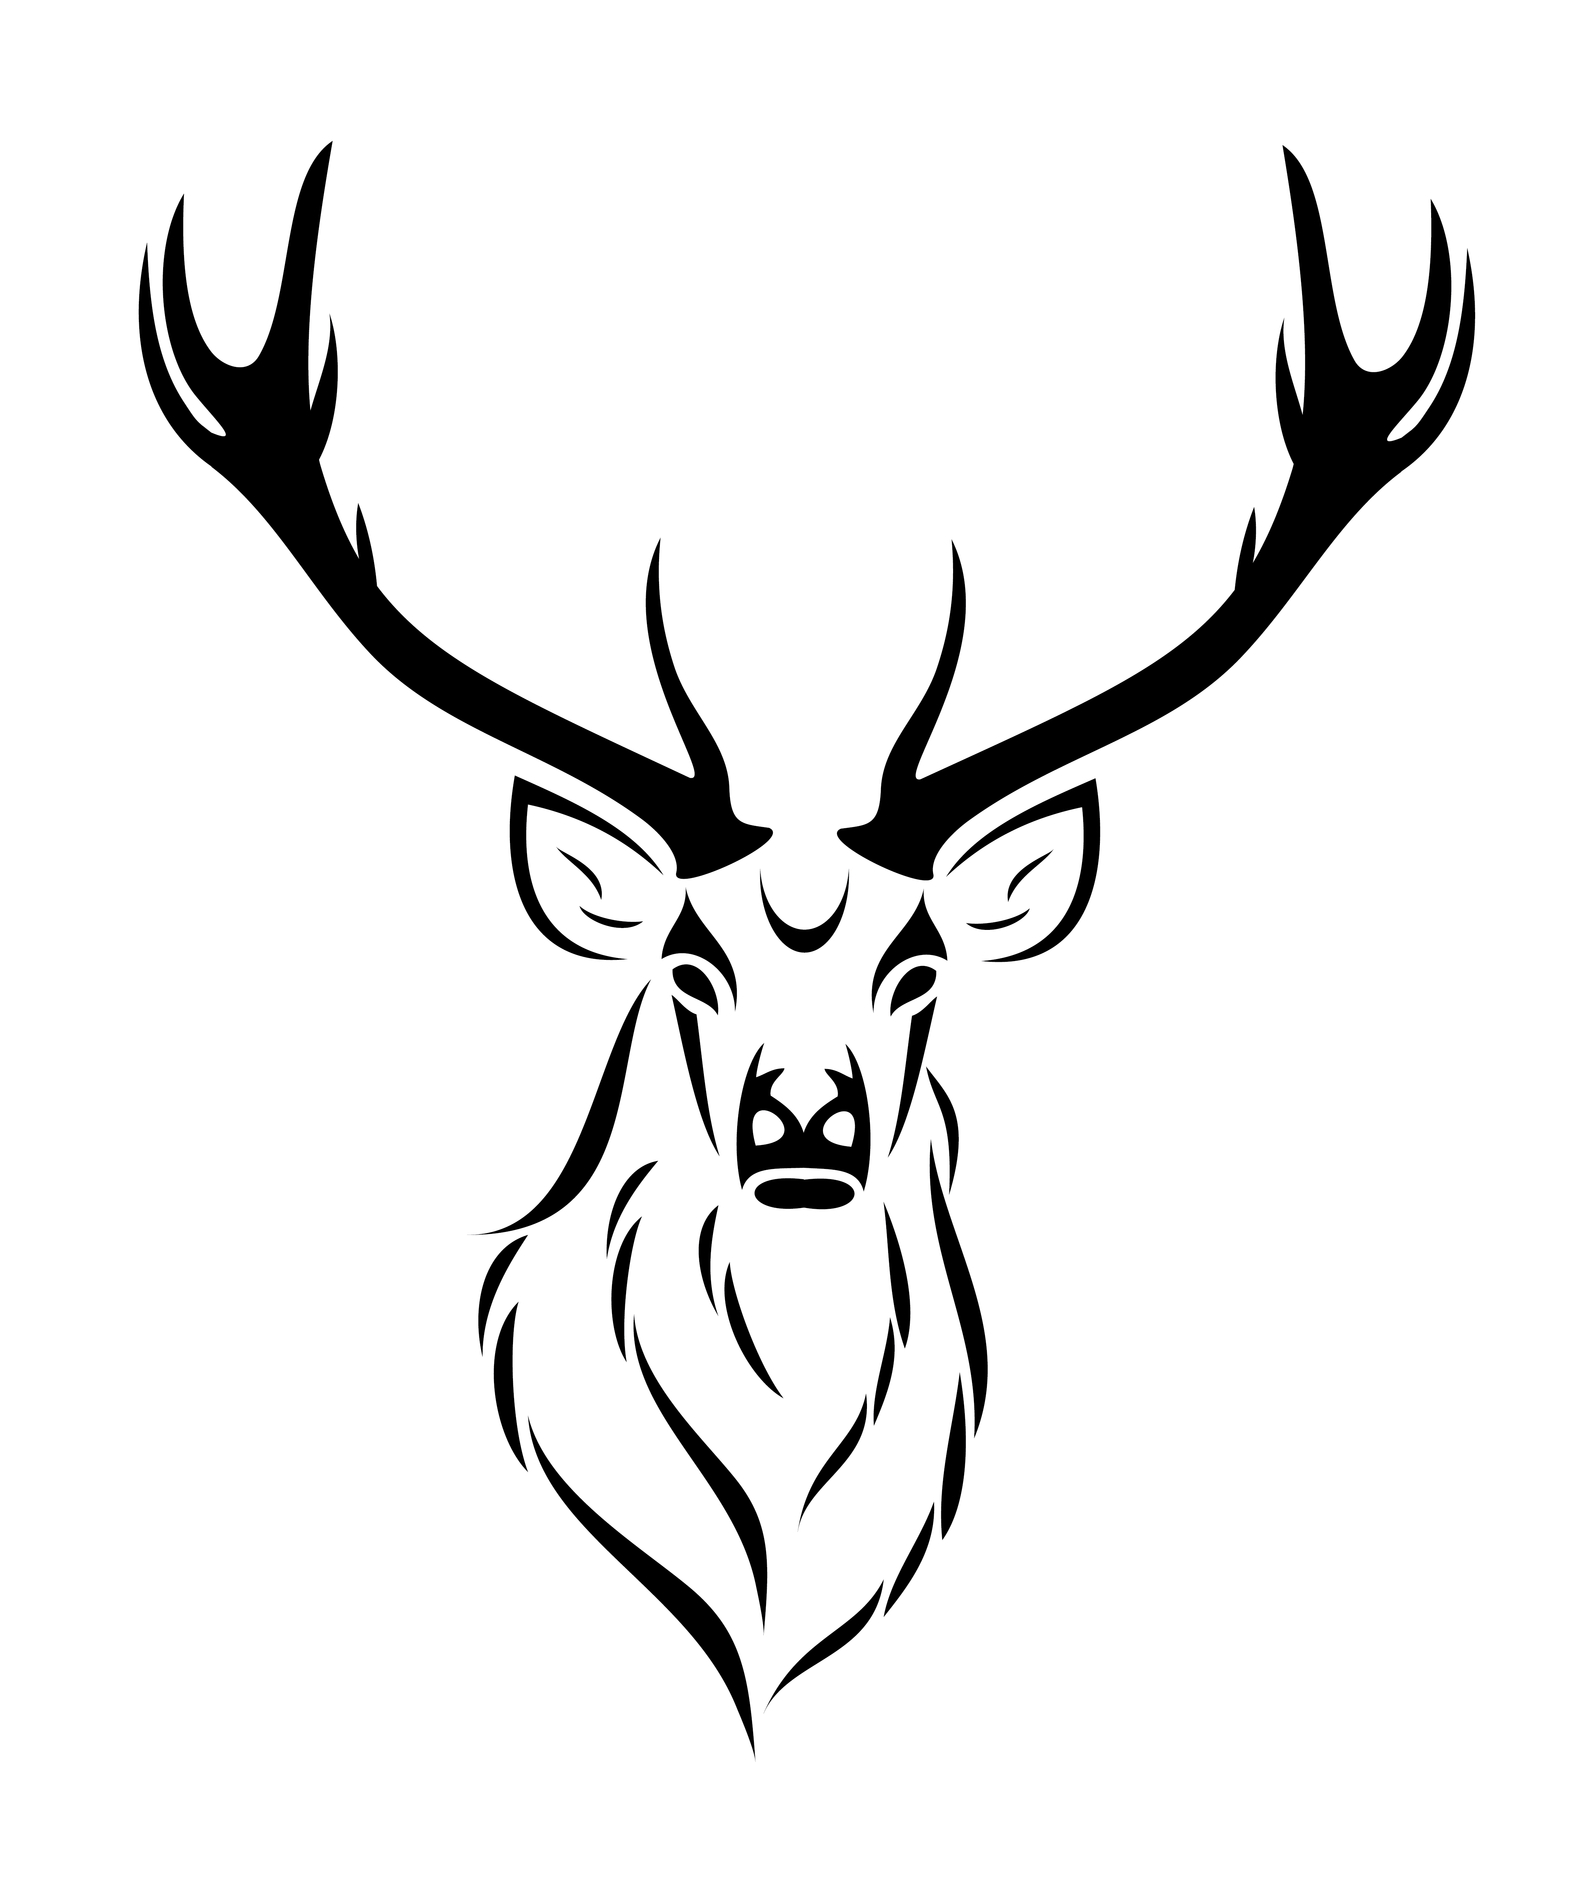 Deer Skull Drawing | Clipart Panda - Free Clipart Images